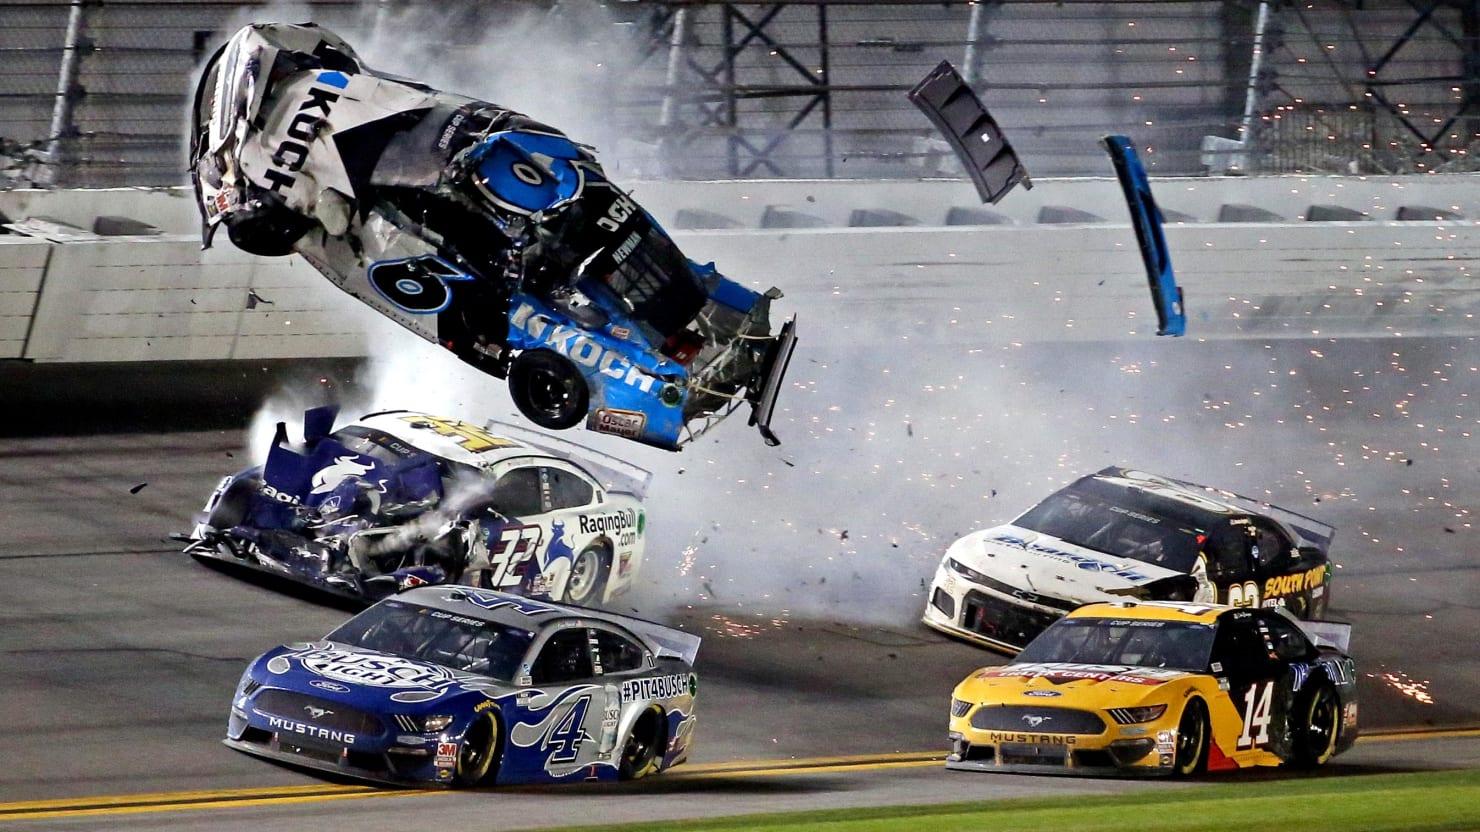 Daytona 500 Driver Ryan Newman 'Seriously Injured' in Horror Crash